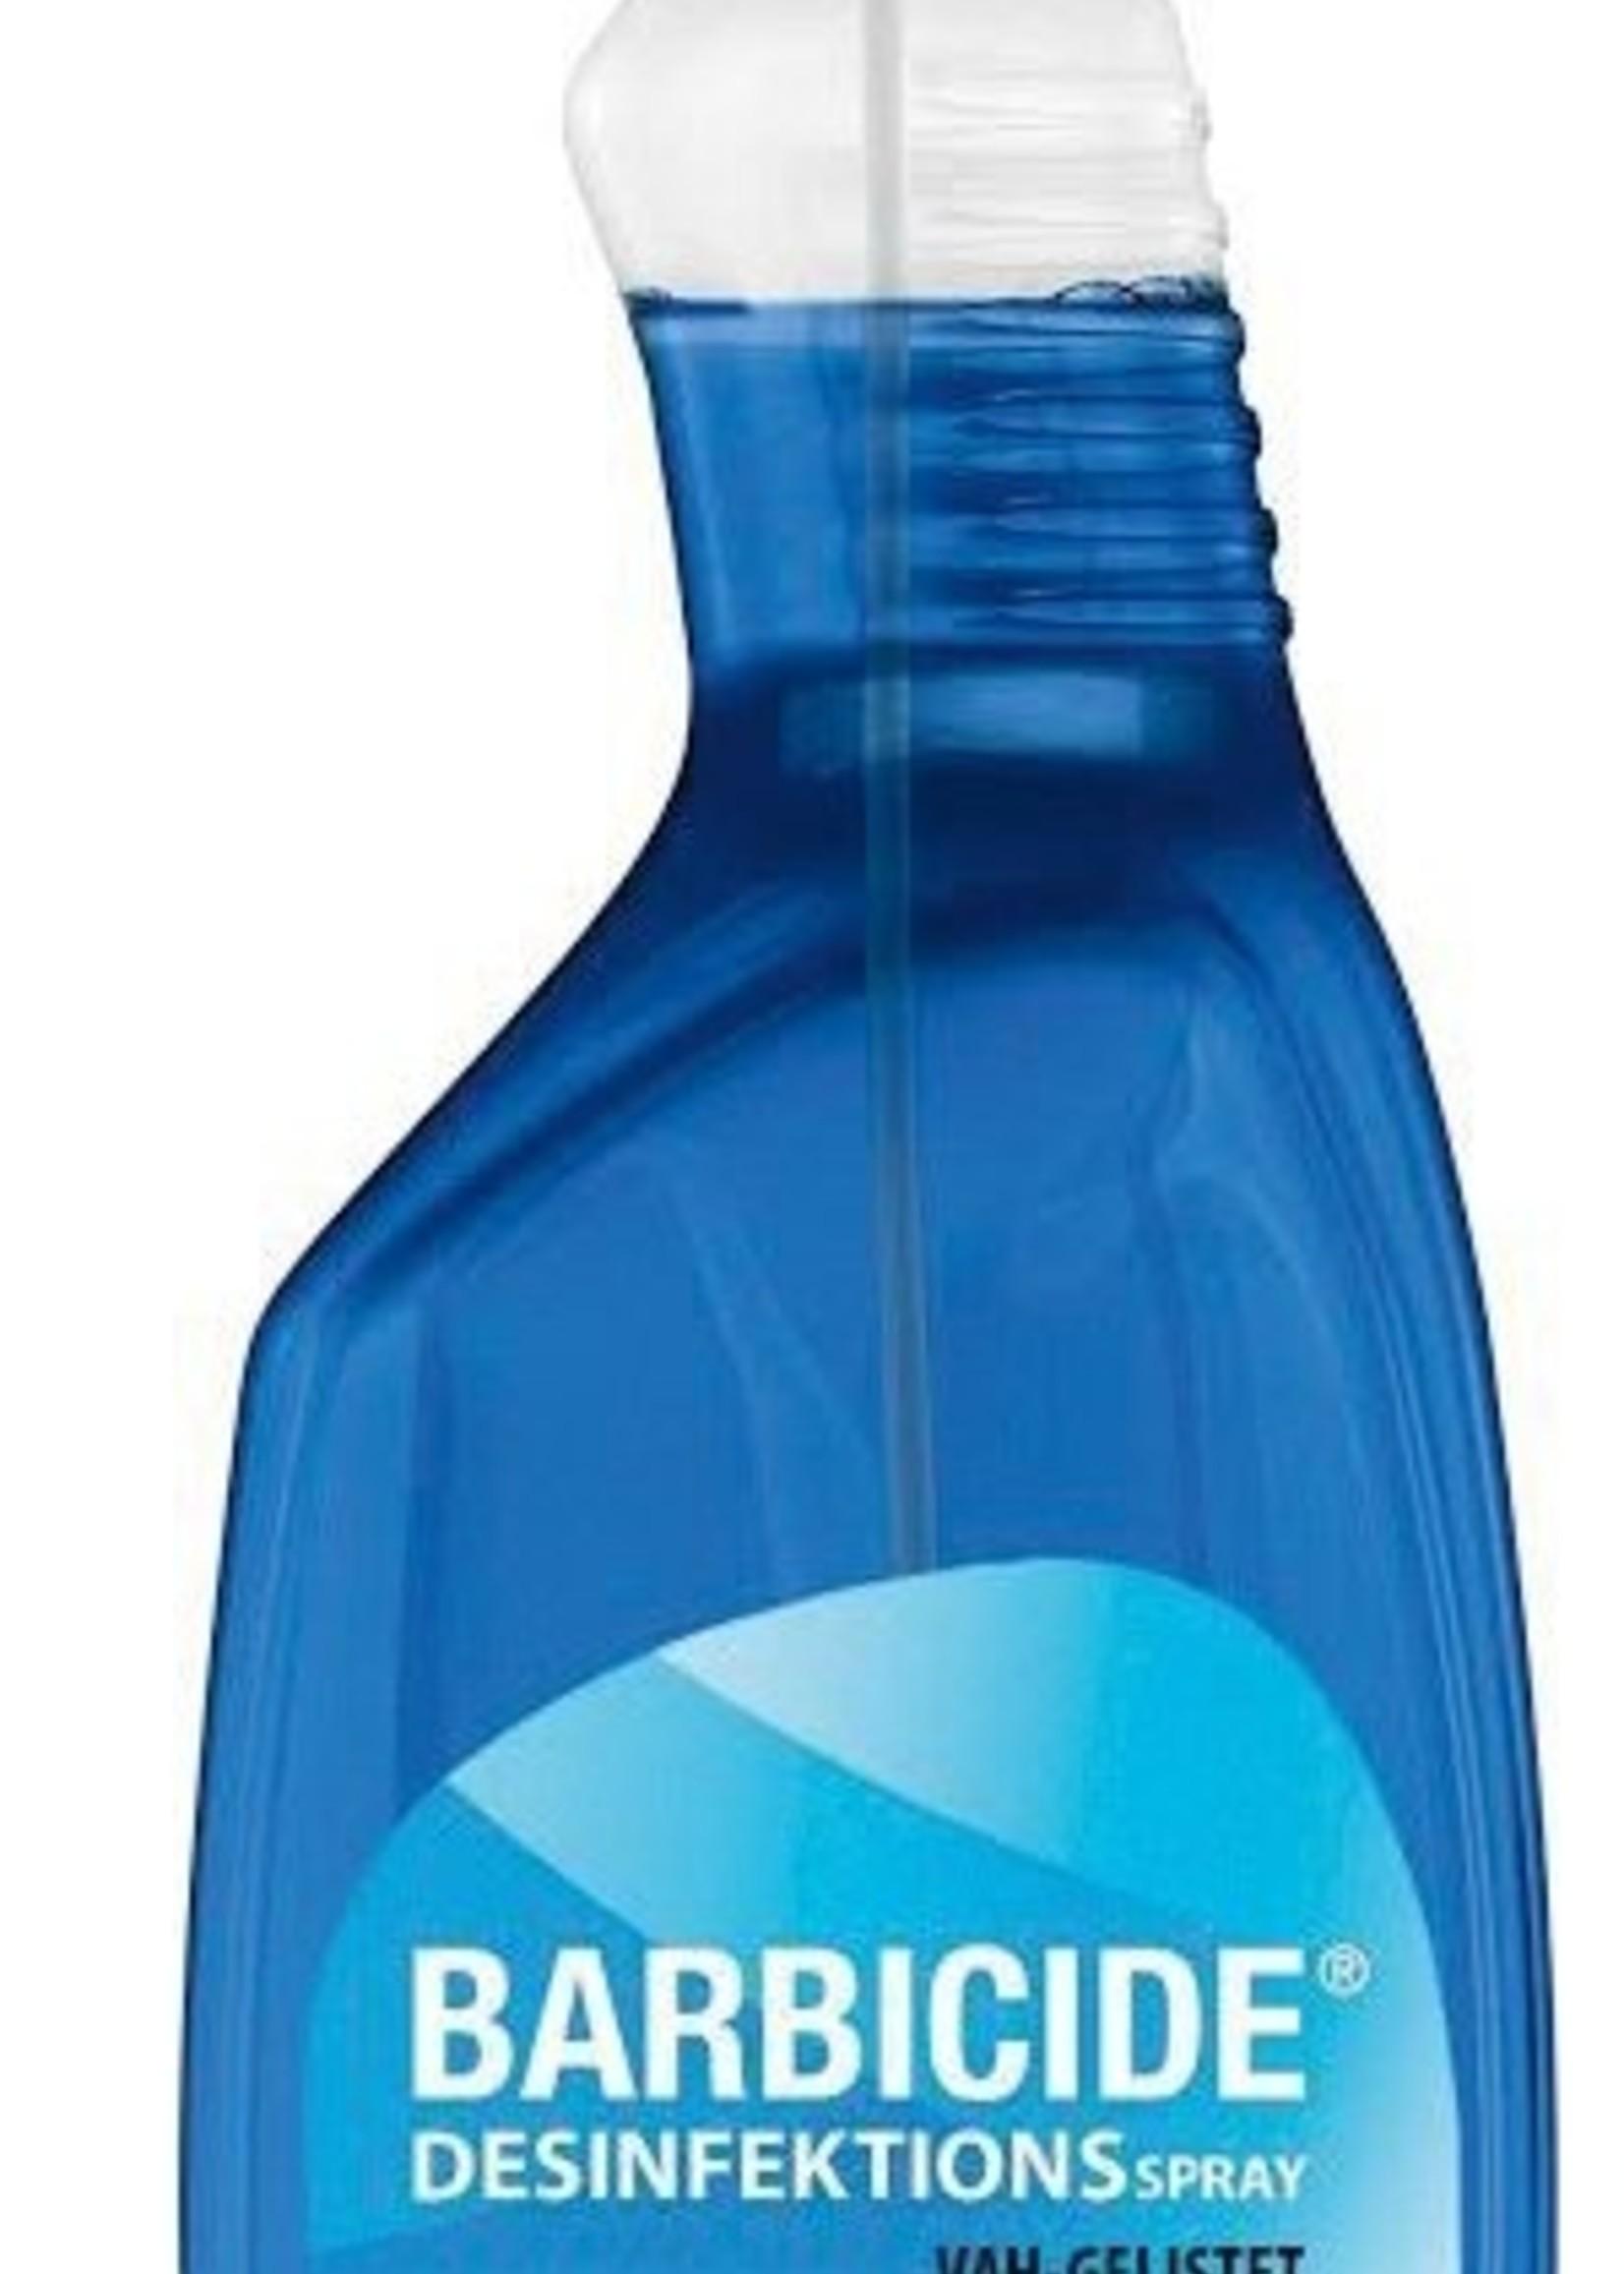 Barbicide  Barbicide Desinfektionsspray Hygiëne-Spray 1000ml